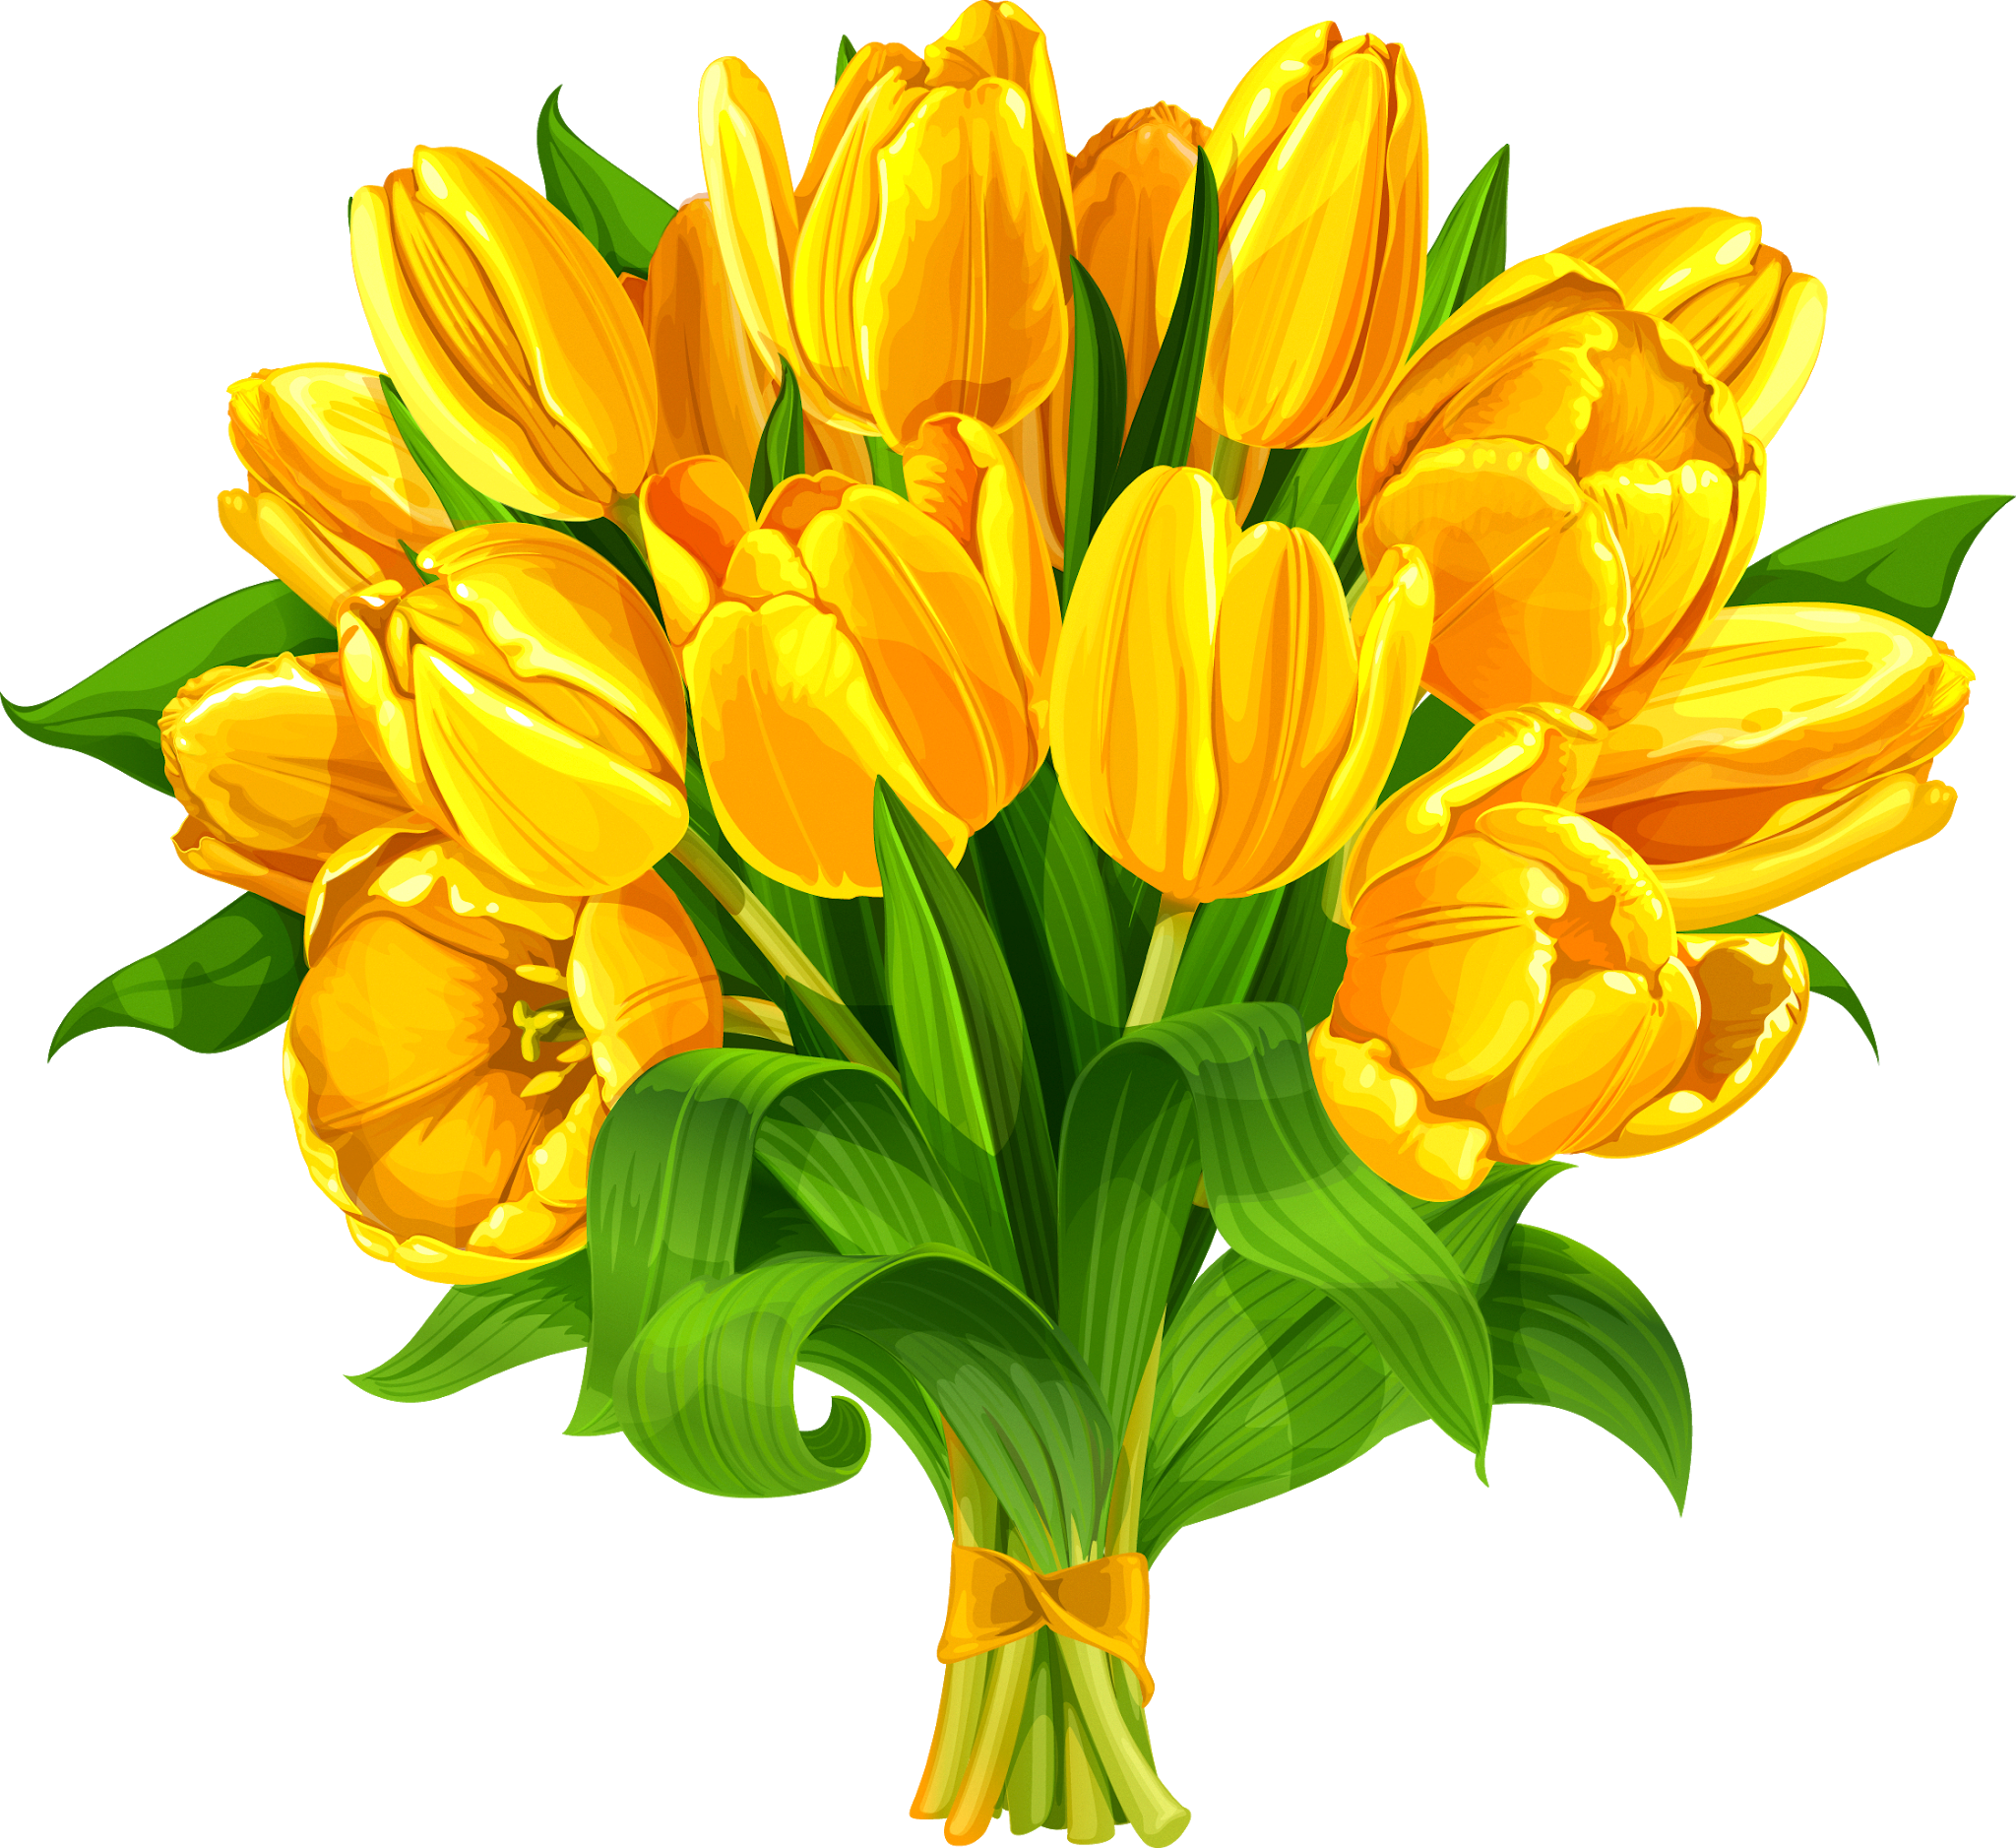 Tulip Flower bouquet Yellow - Flower bouquet Tulip Clip ... (2048 x 1877 Pixel)